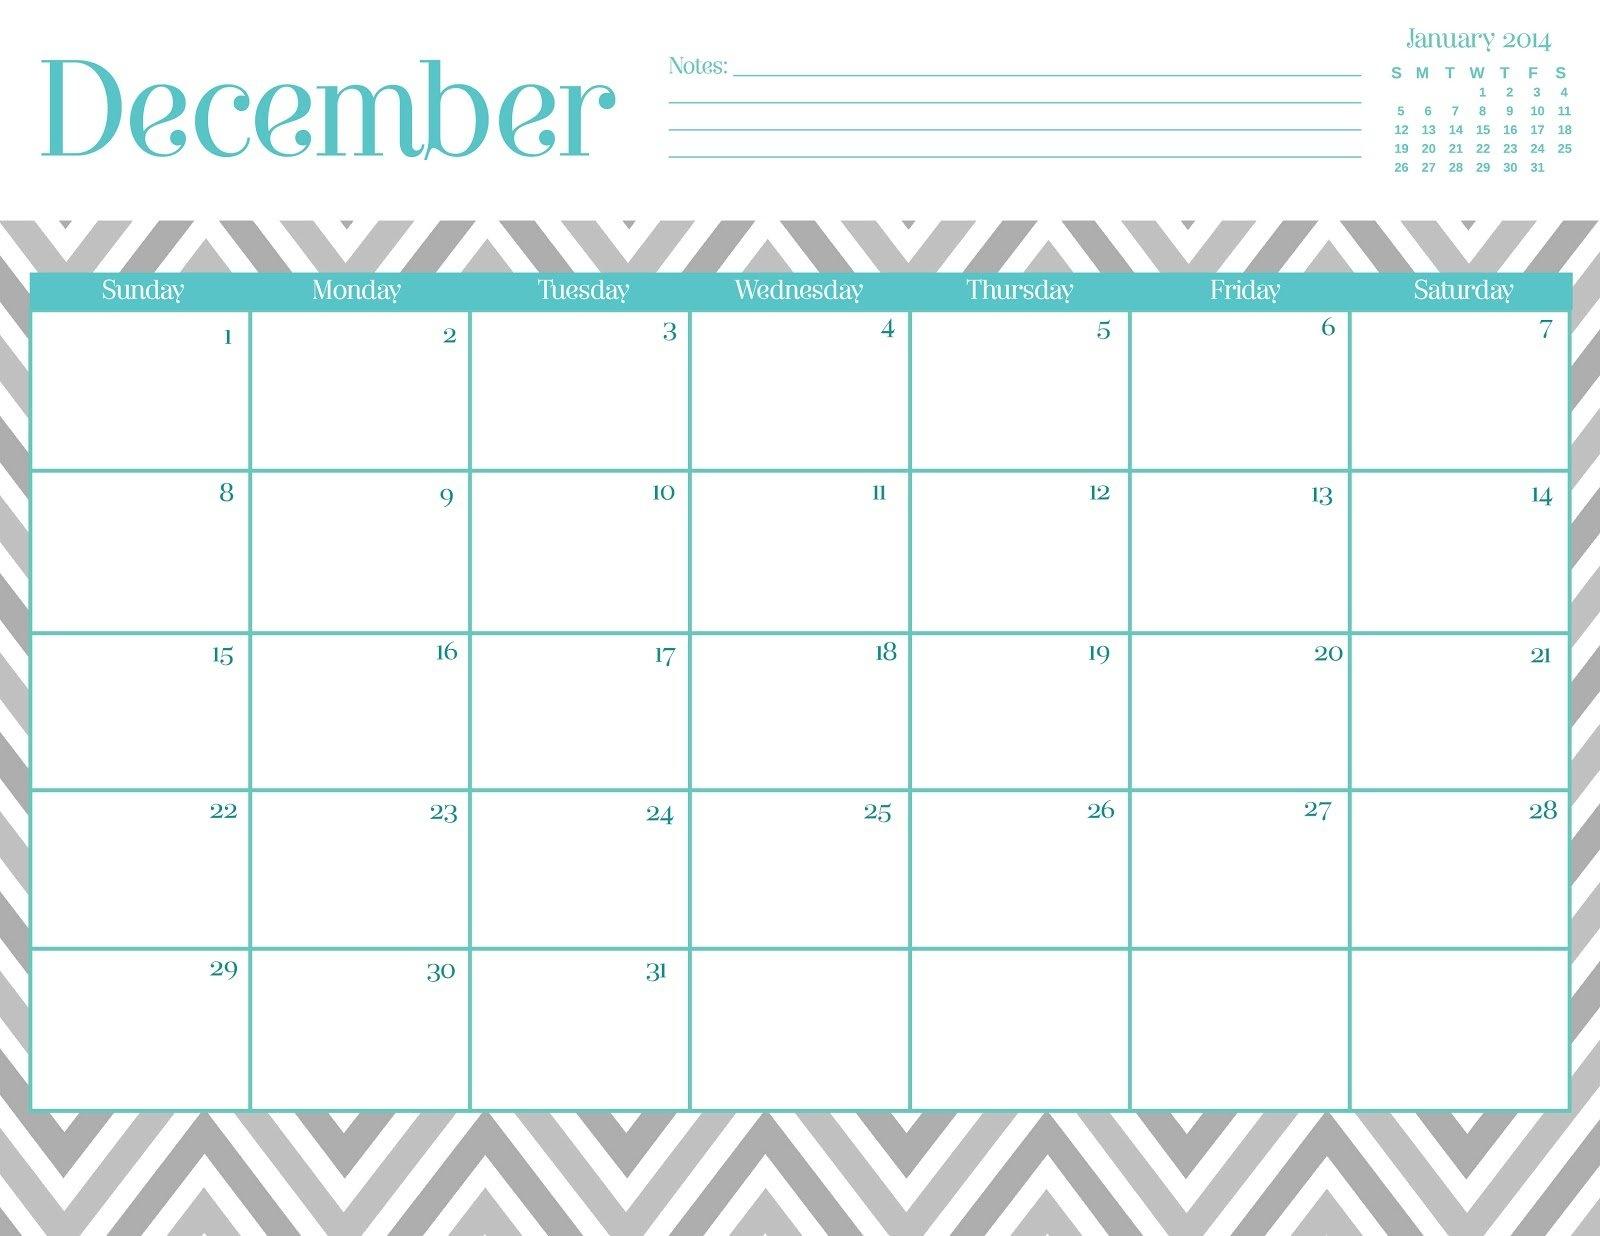 Oh So Lovely Blog: Free 2013 Chevron Calendar Aol Free Printable Calendar